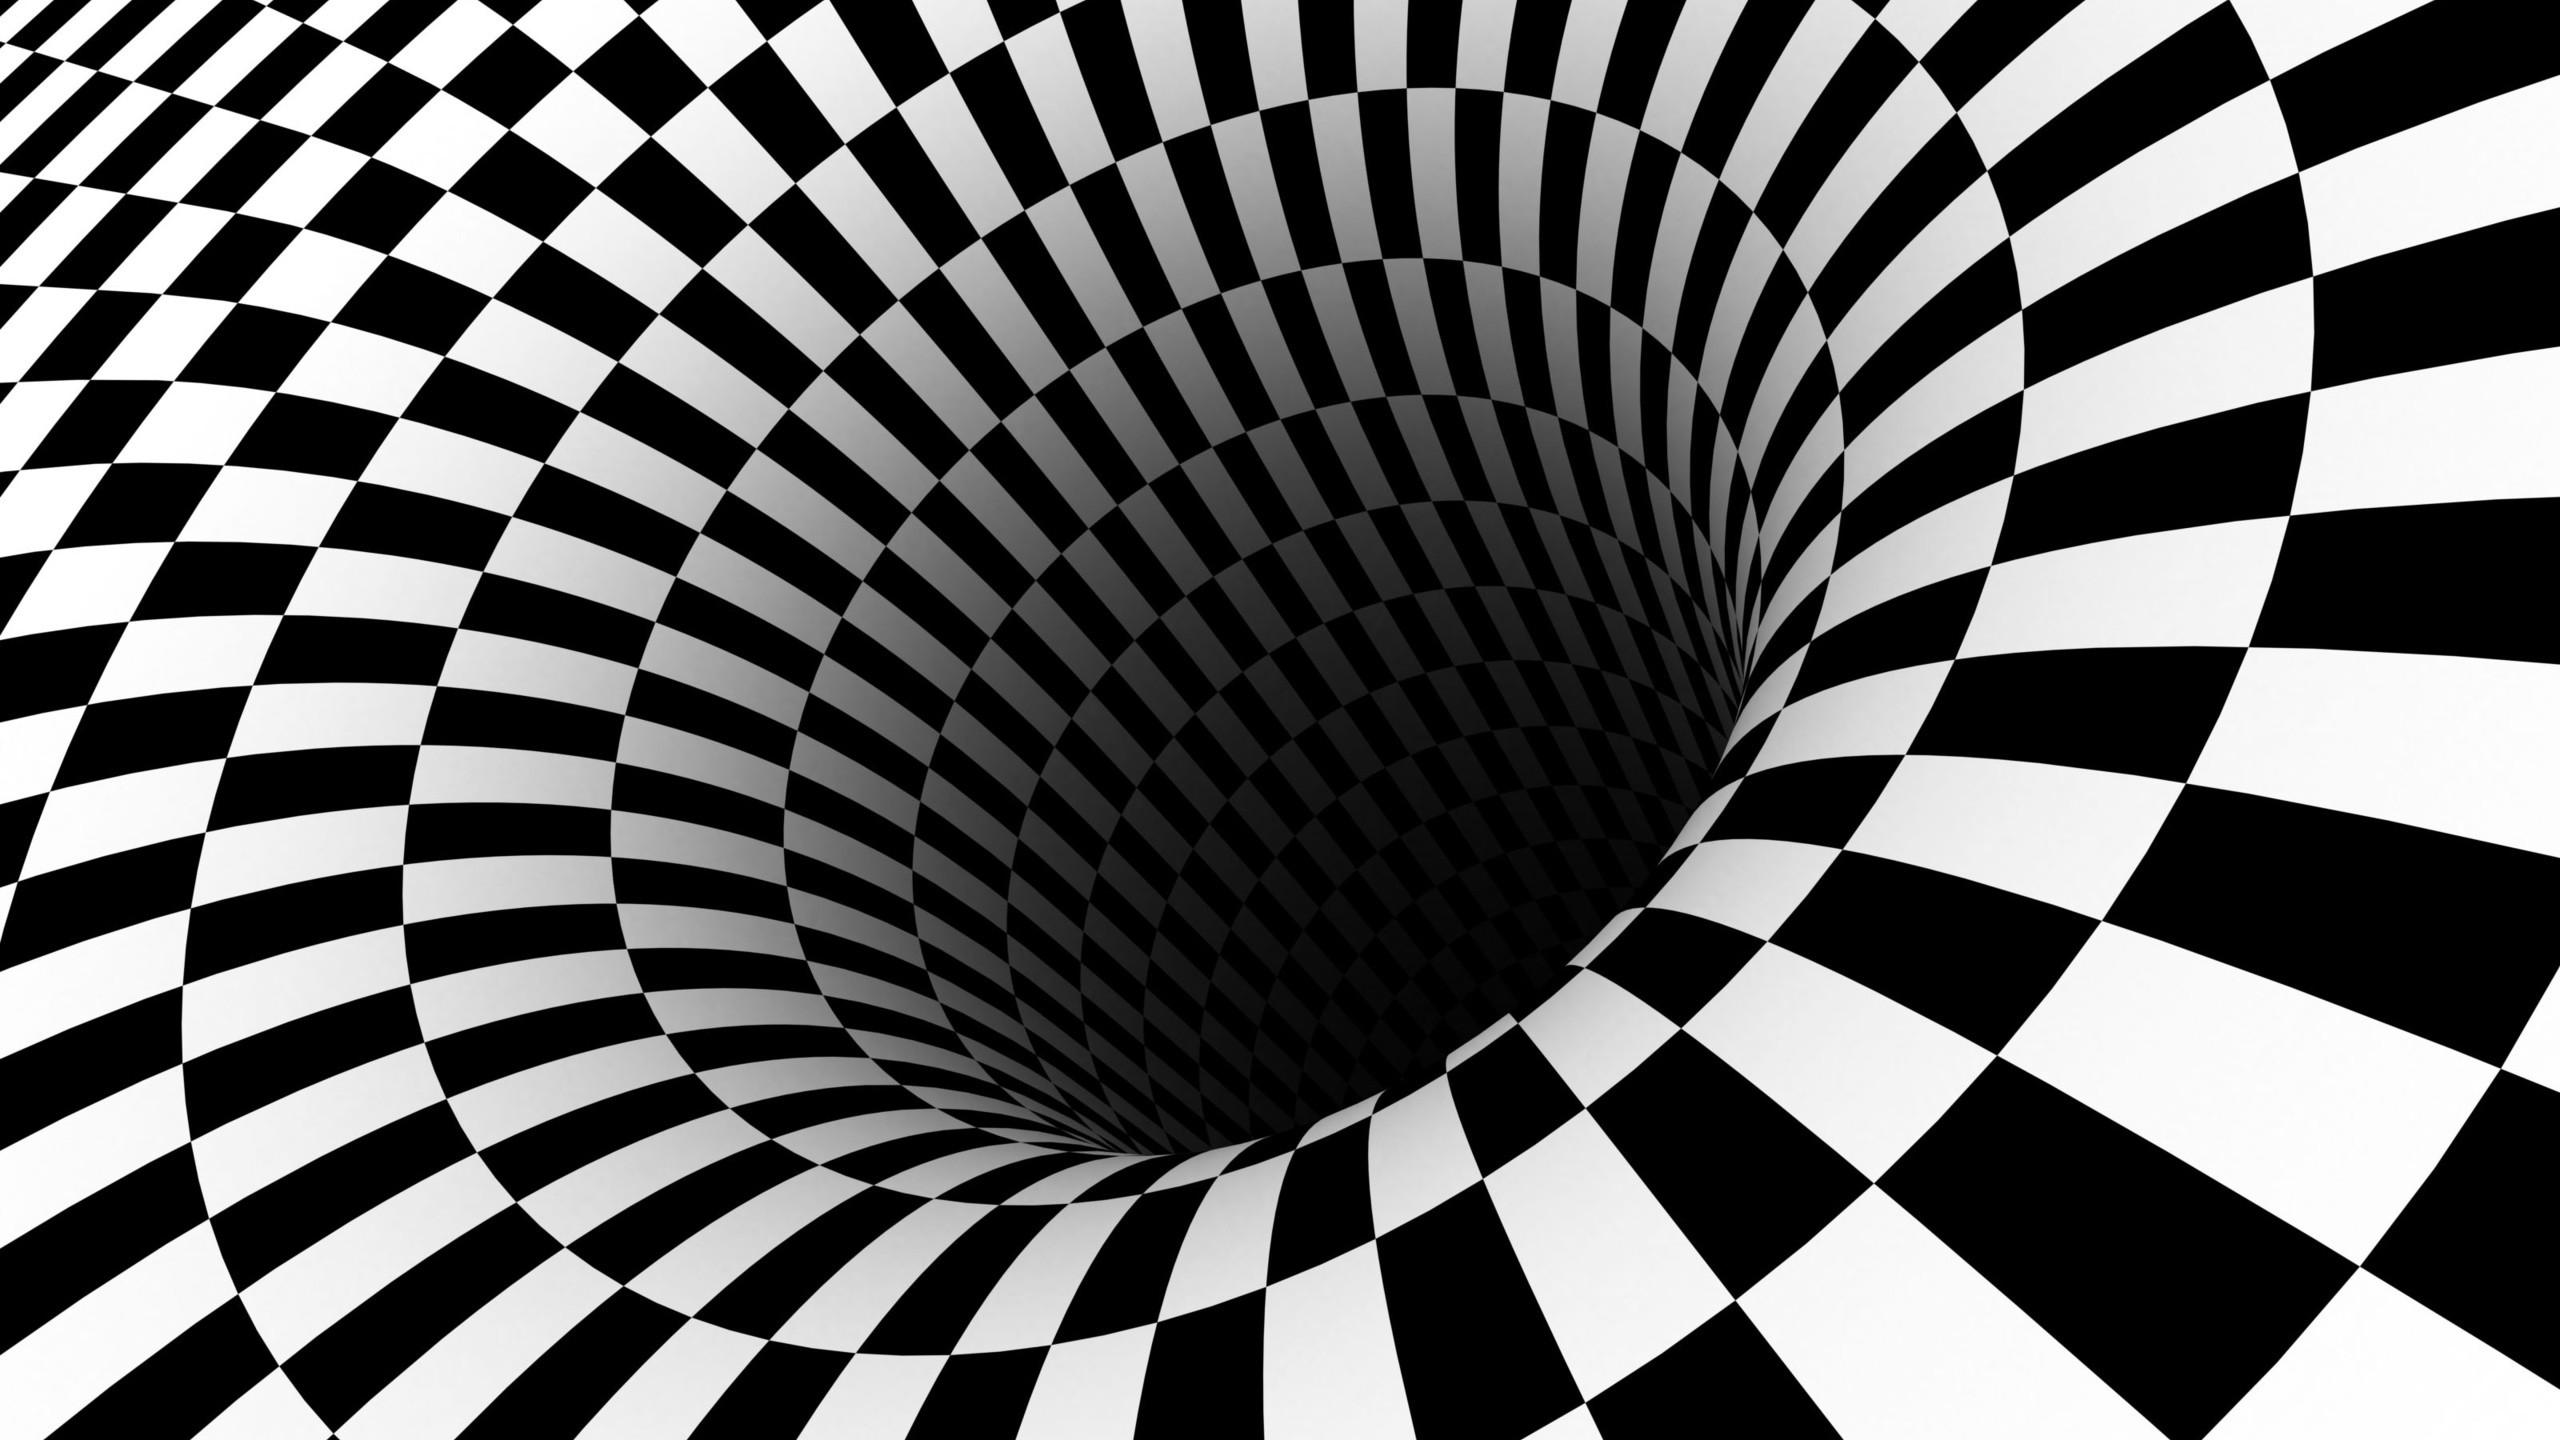 Res: 2560x1440, 3d Wallpapers, Hole, 3d Images, 3d Hd, Vortex, Optical, Illusions